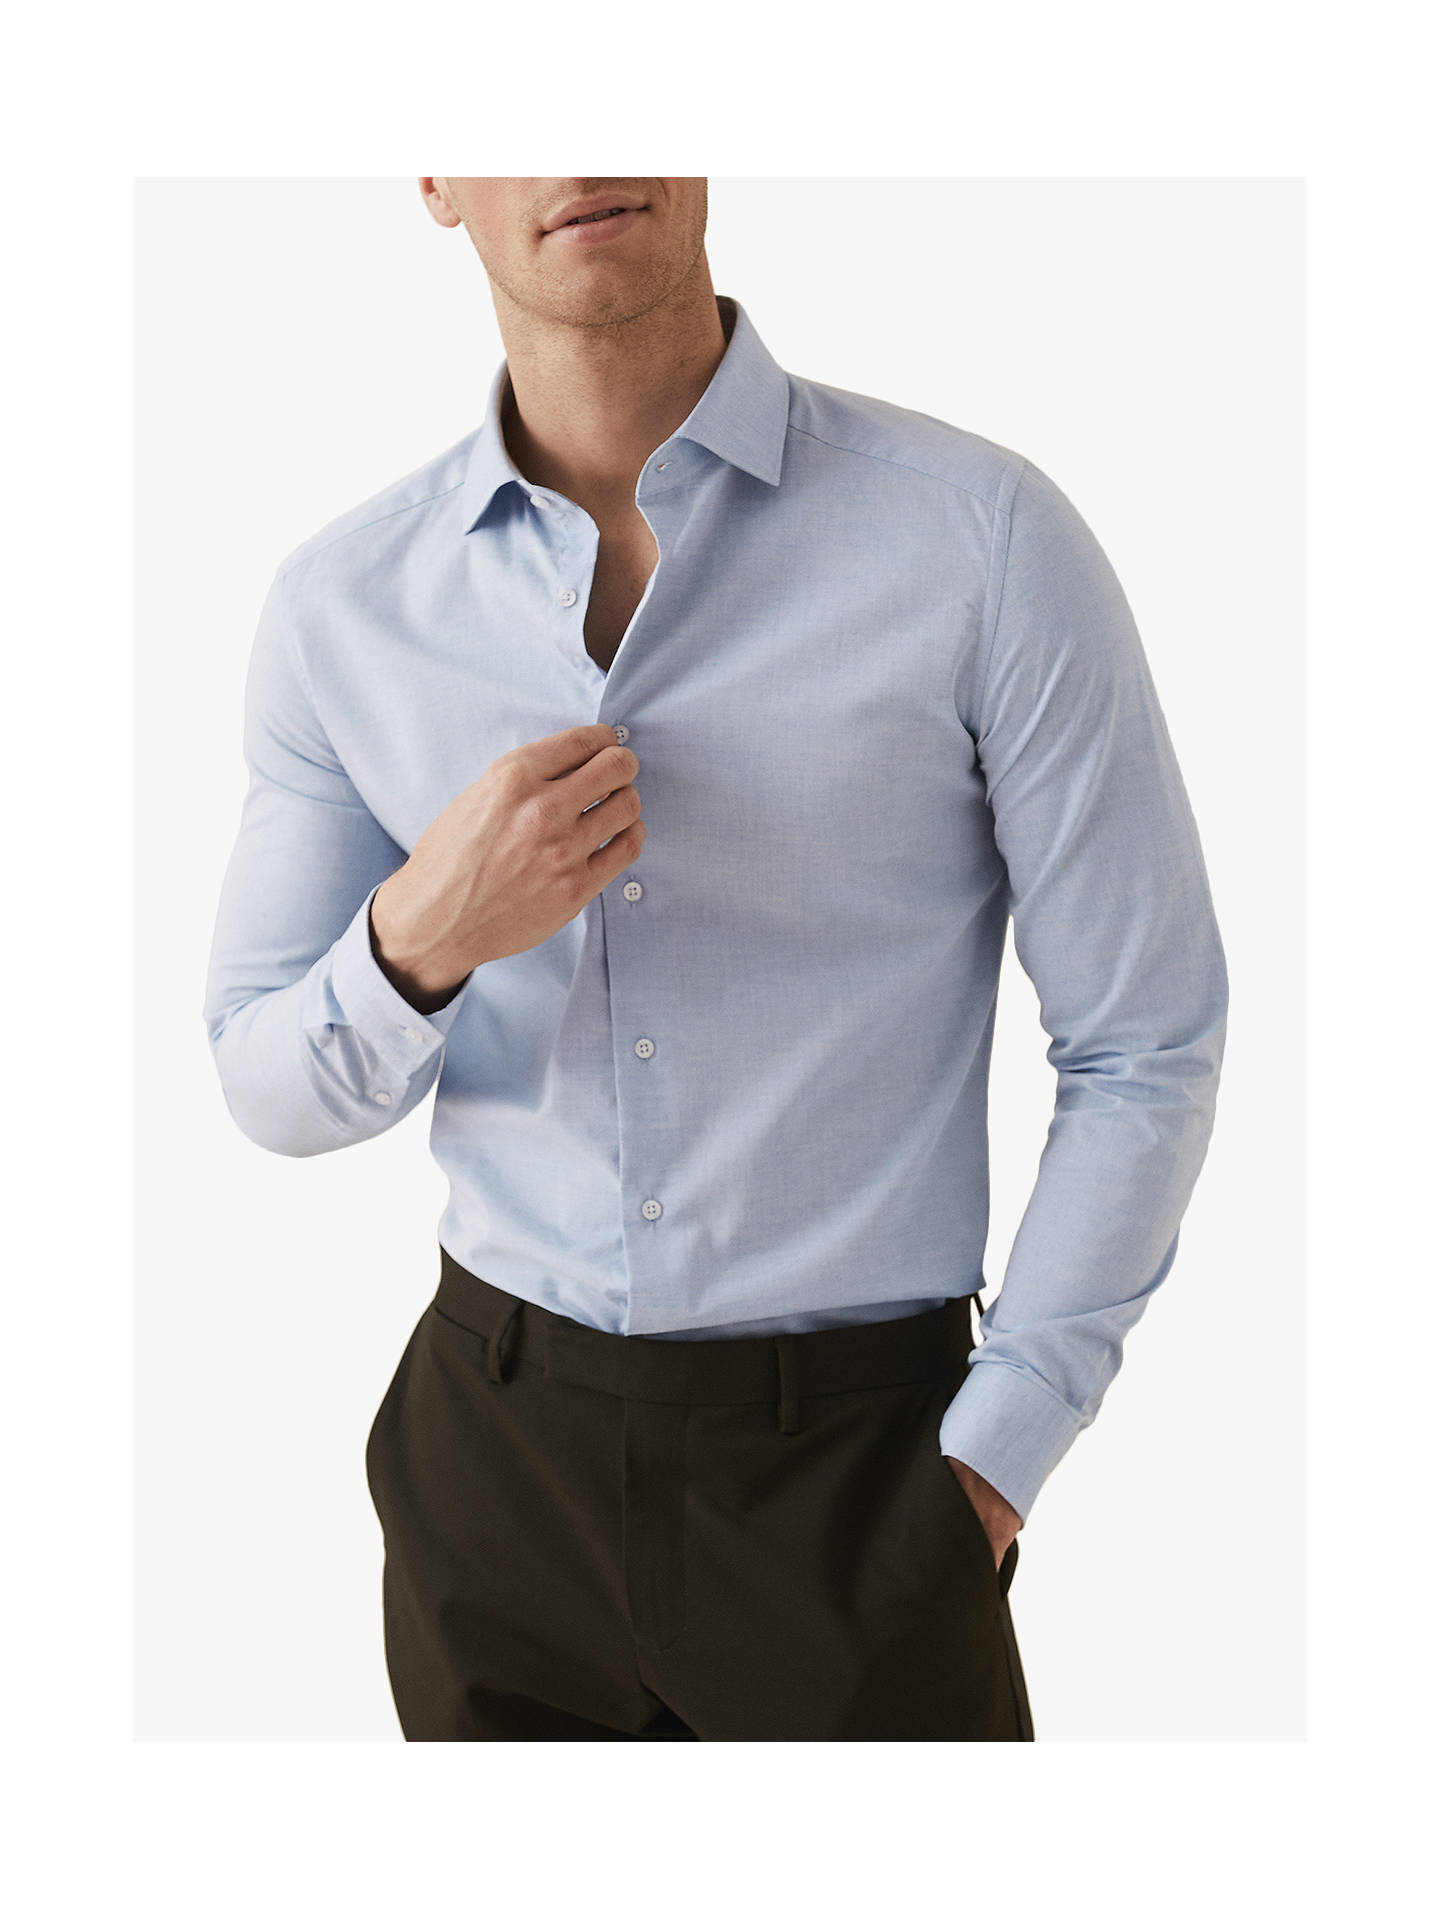 4d4960e5a Buy Reiss Irving Cotton Slim Fit Shirt, Light Blue, XS Online at johnlewis.